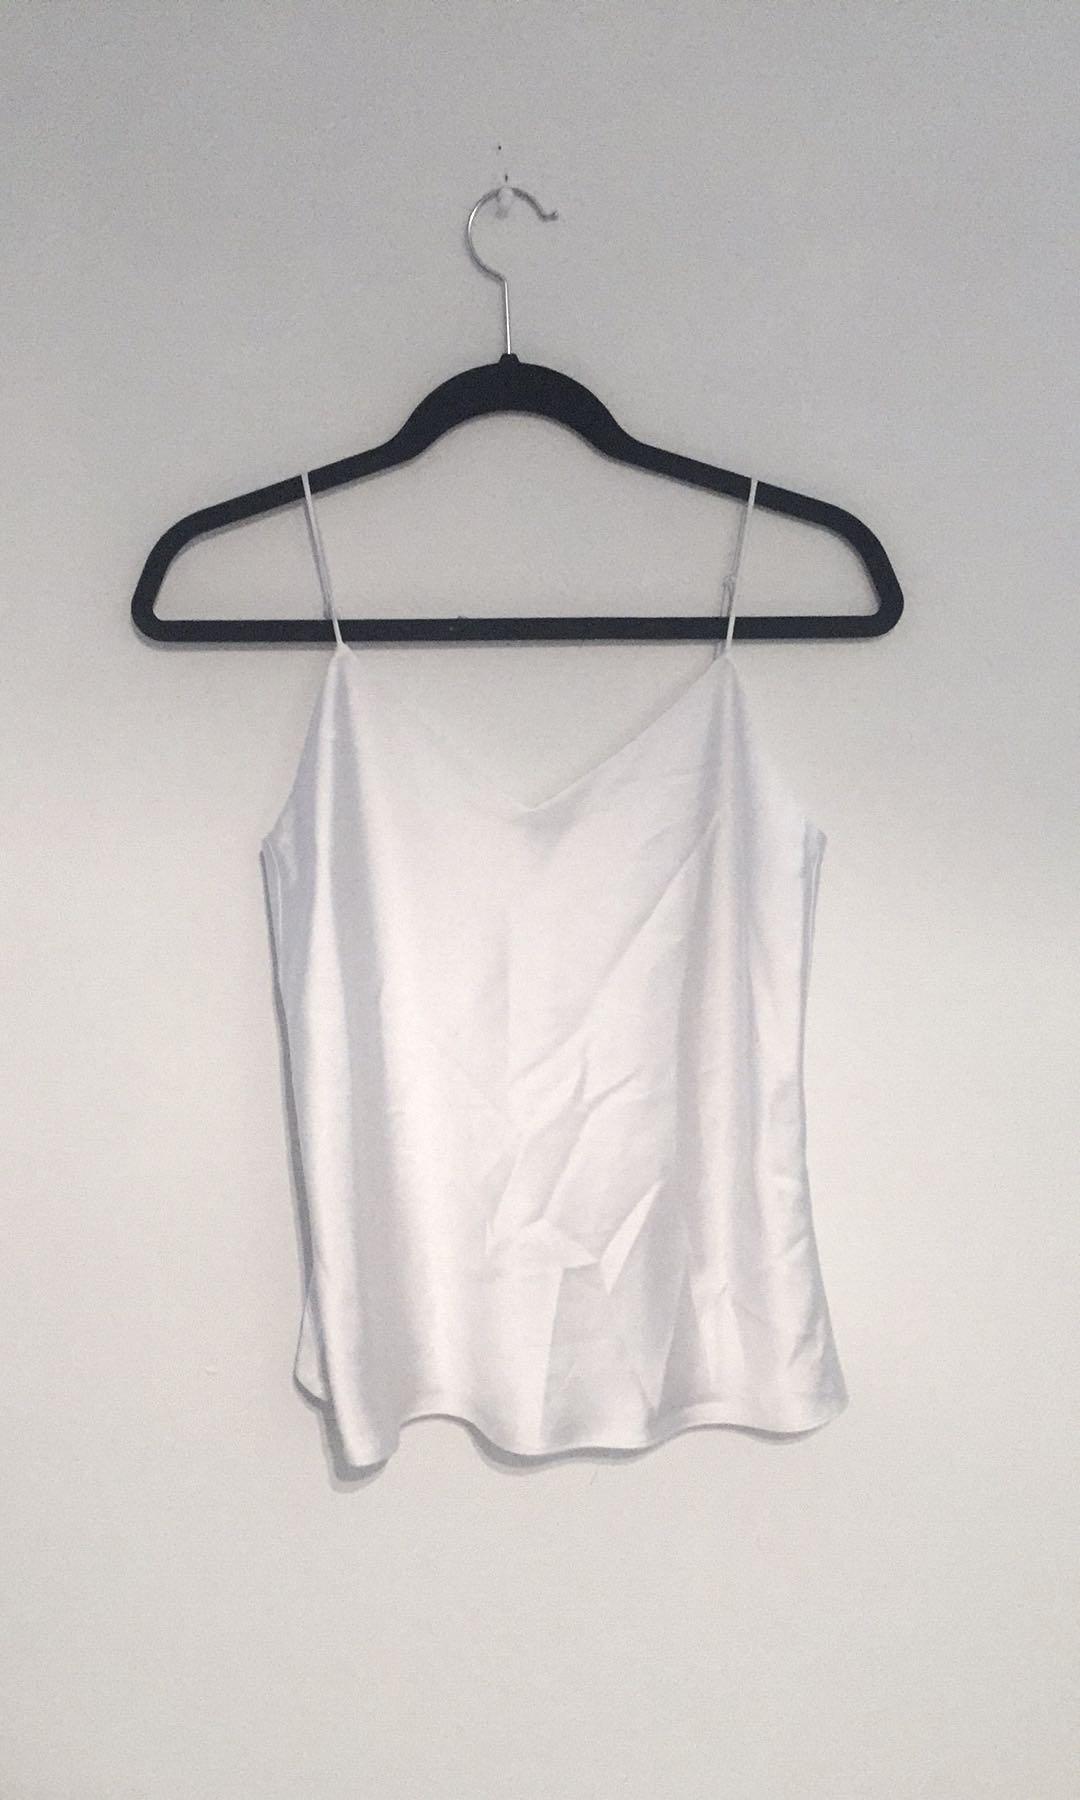 Satin Tank Top/ Camisole (XS)